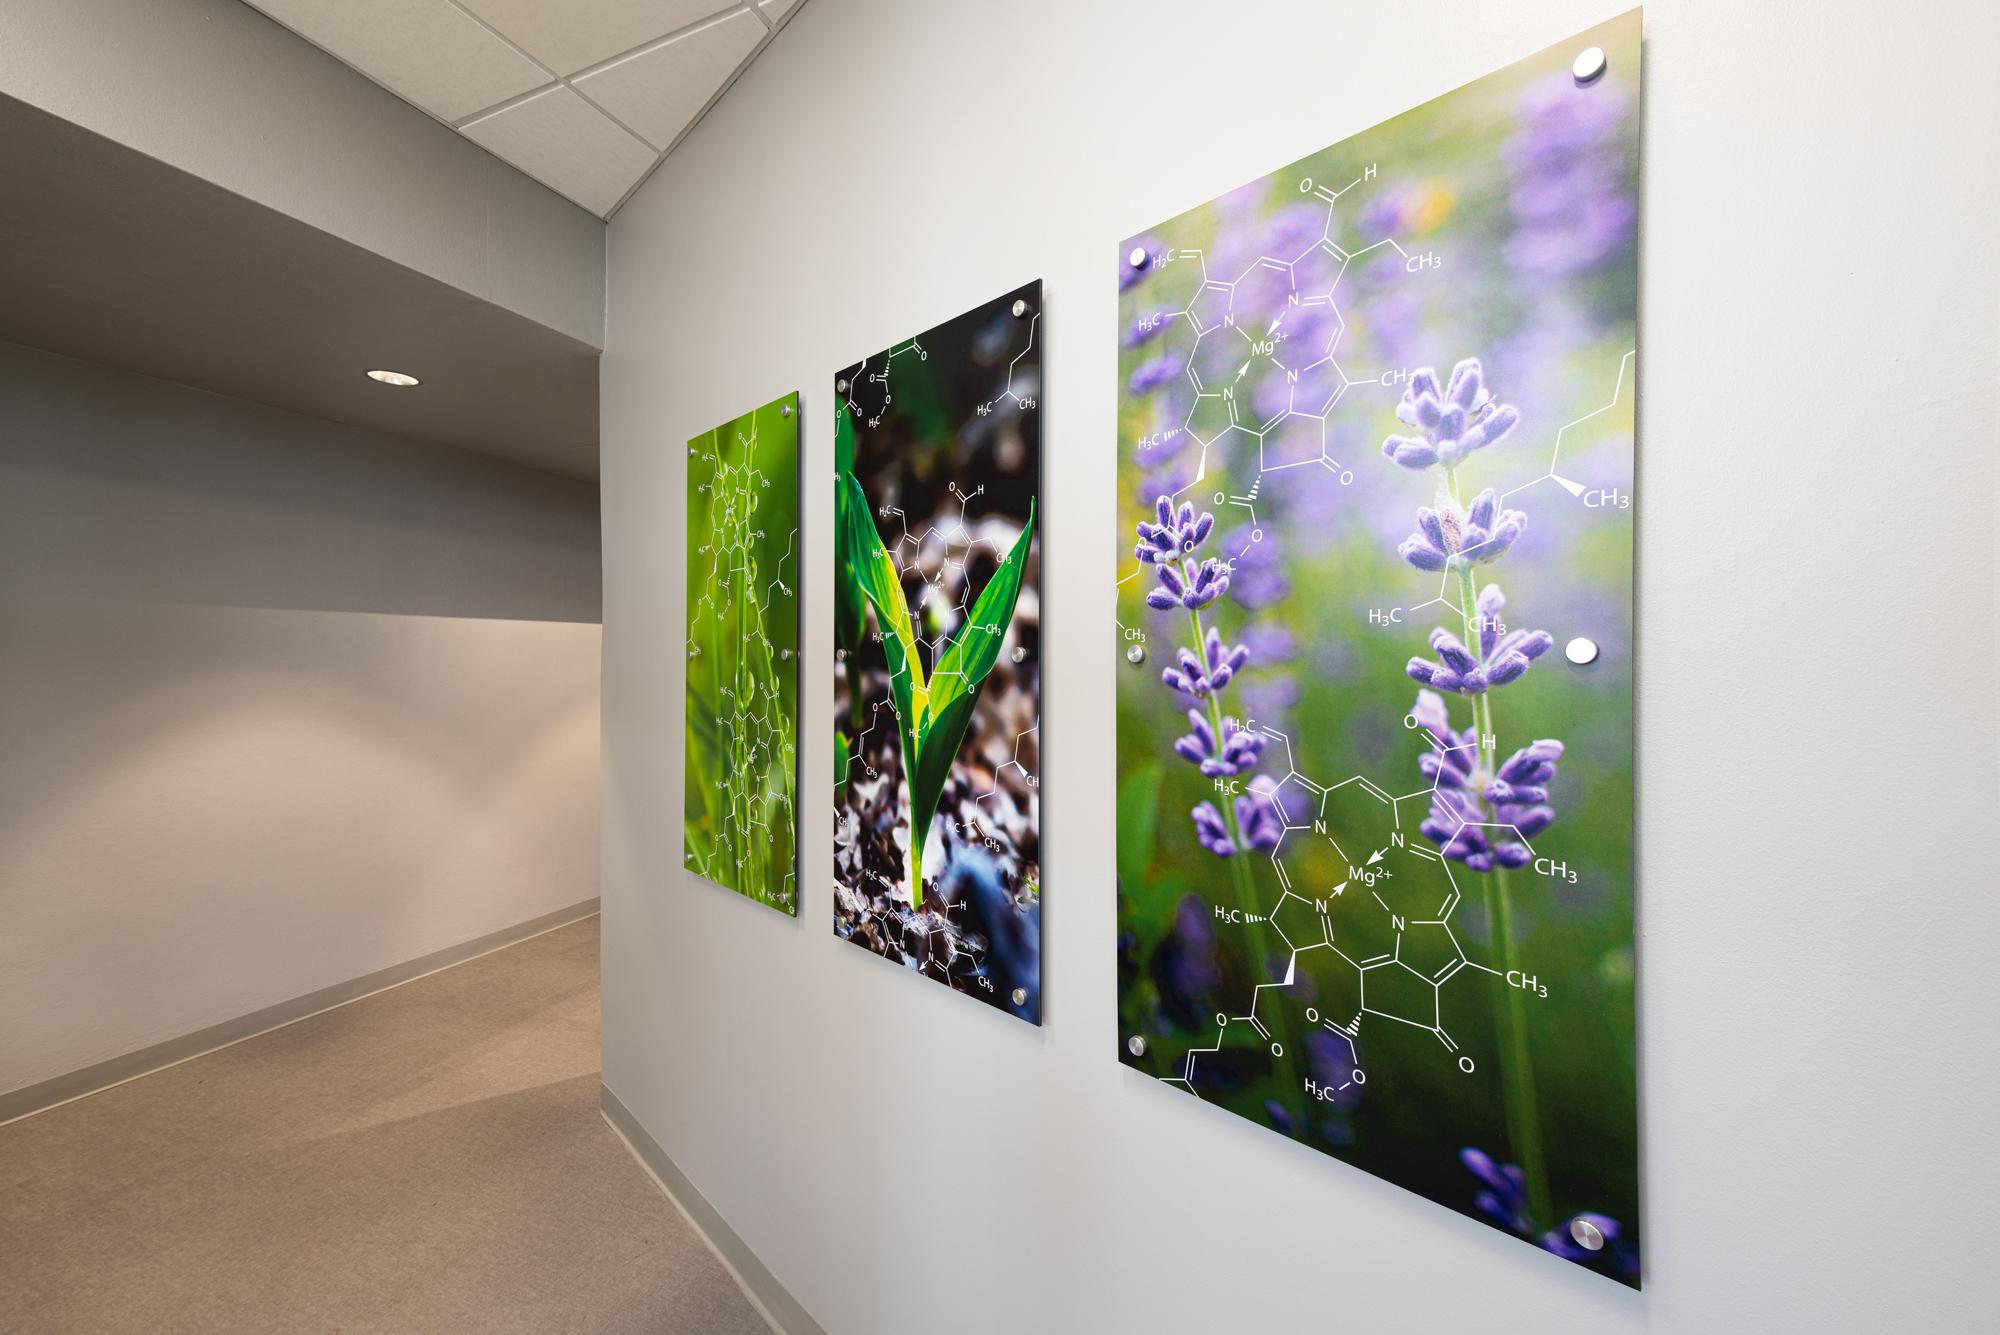 Large Moxie panels at LSUS